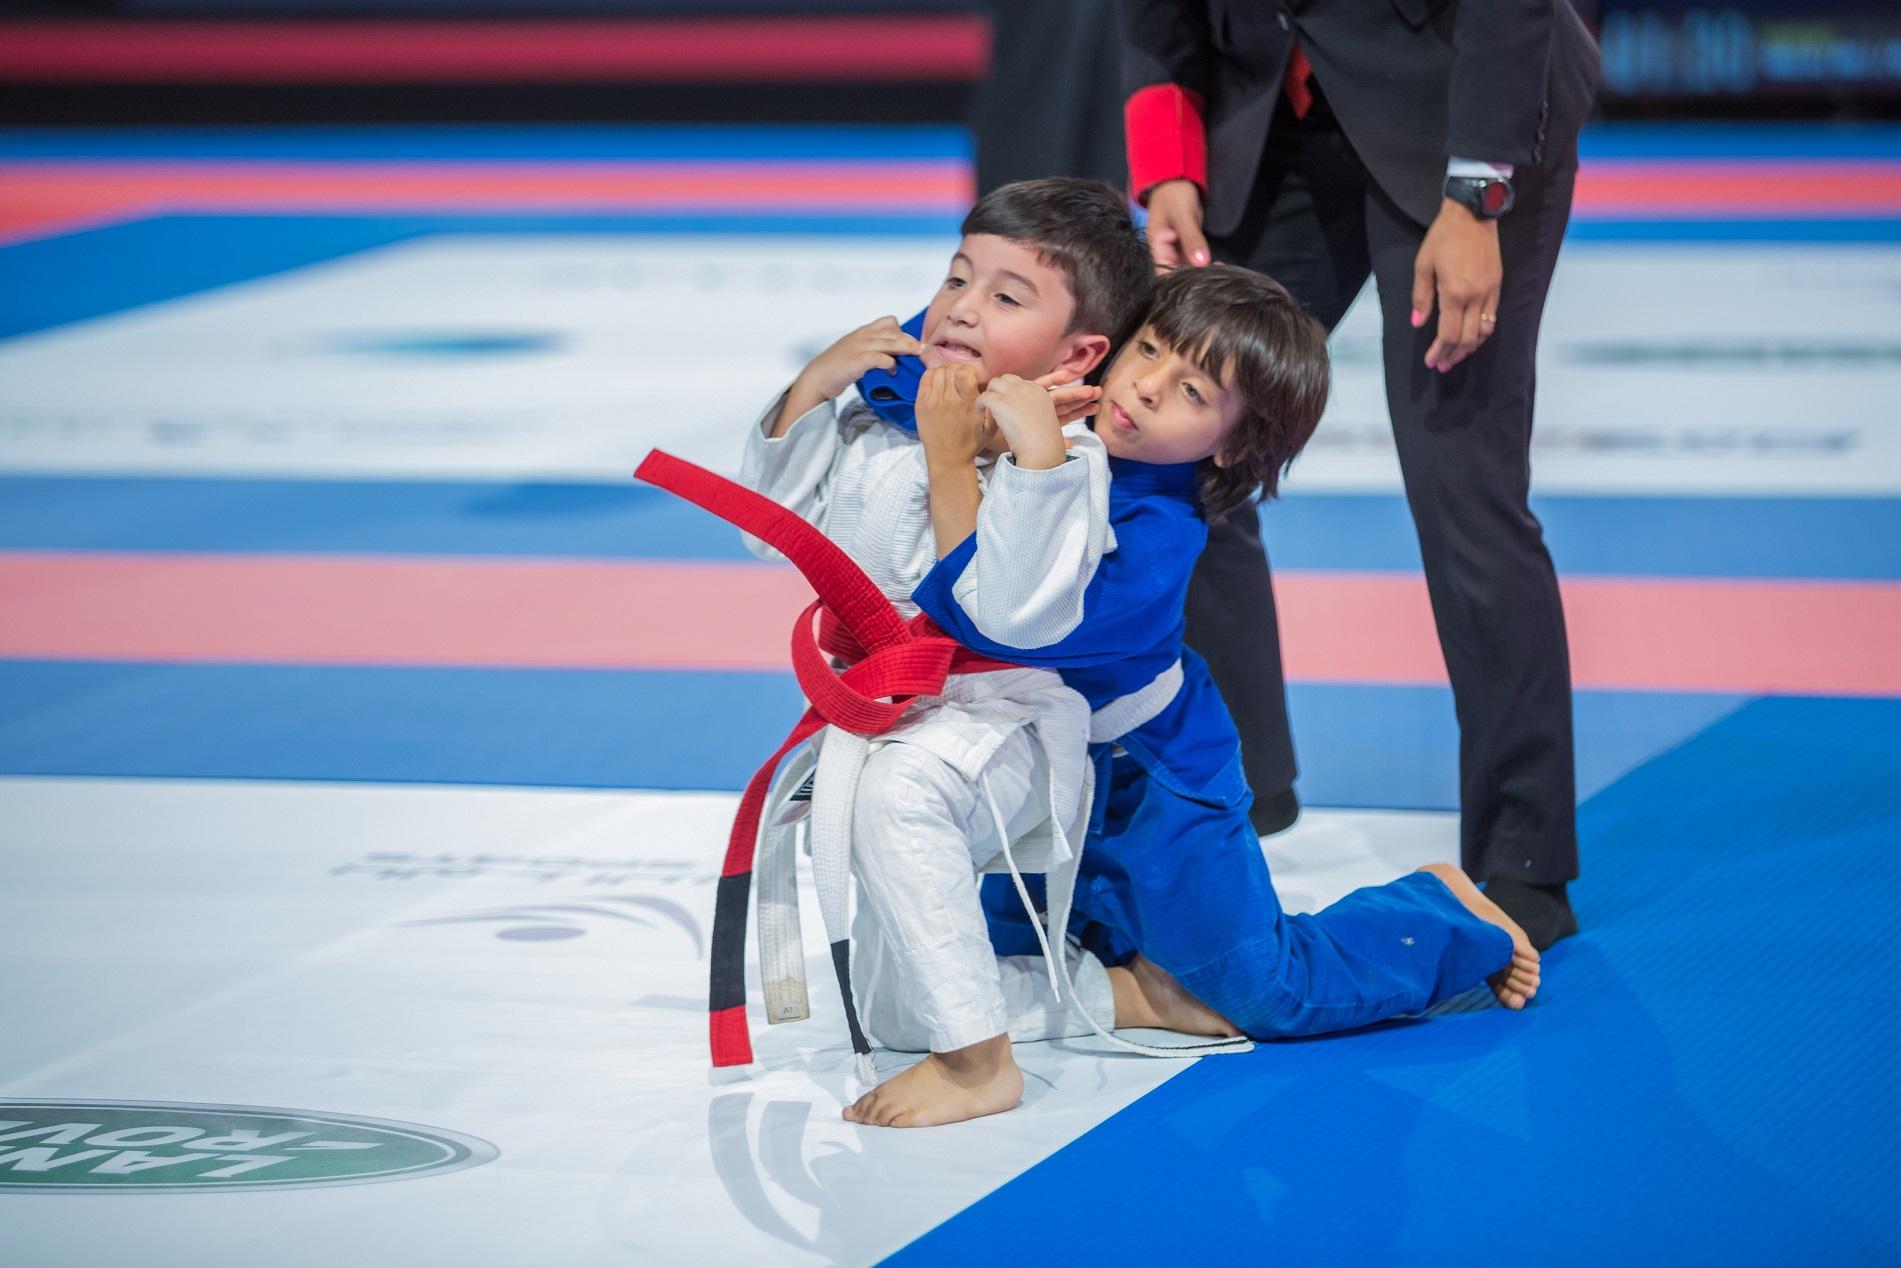 abu dhabi world professional jiu-jitsu championship shows jiu-jitsu is a sport for all 4.jpg